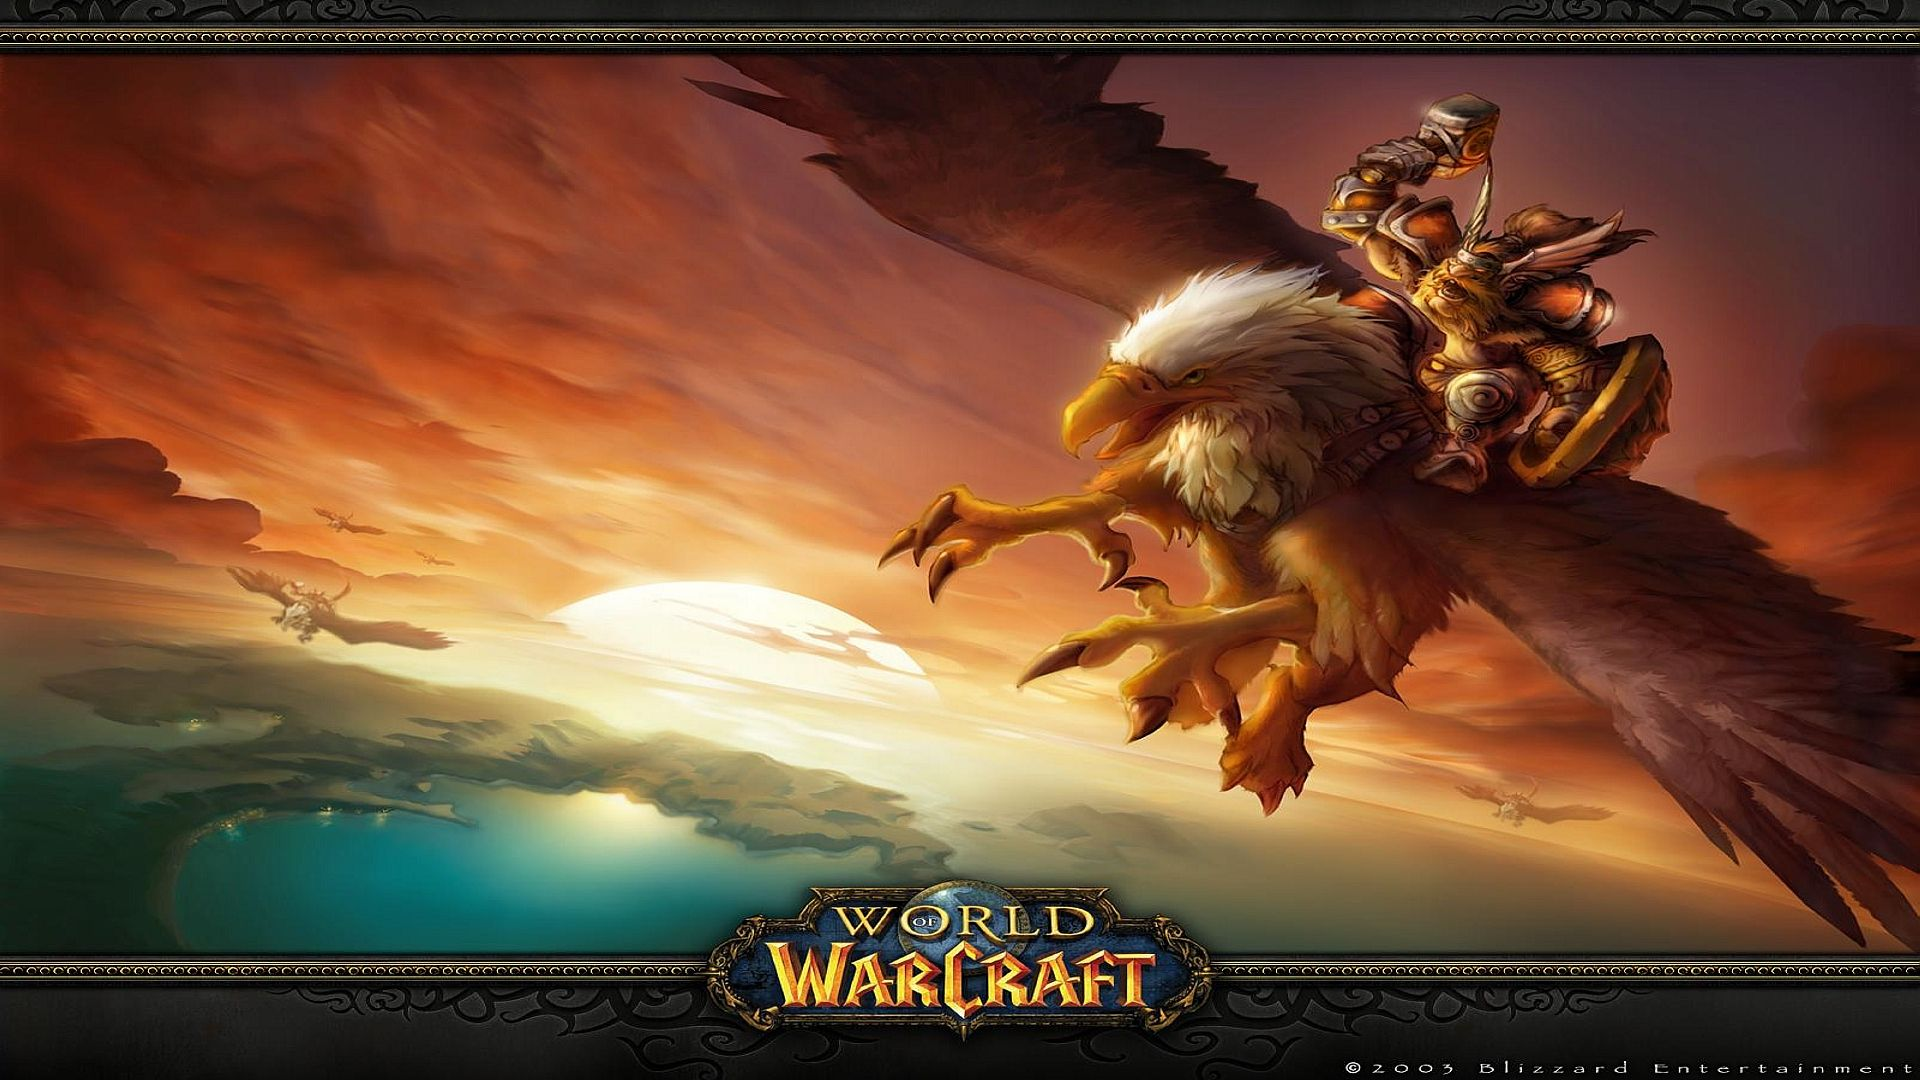 World Of Warcraft Backgrounds 1920x1080: 3 Screen Wallpaper 1920x1080 Wow